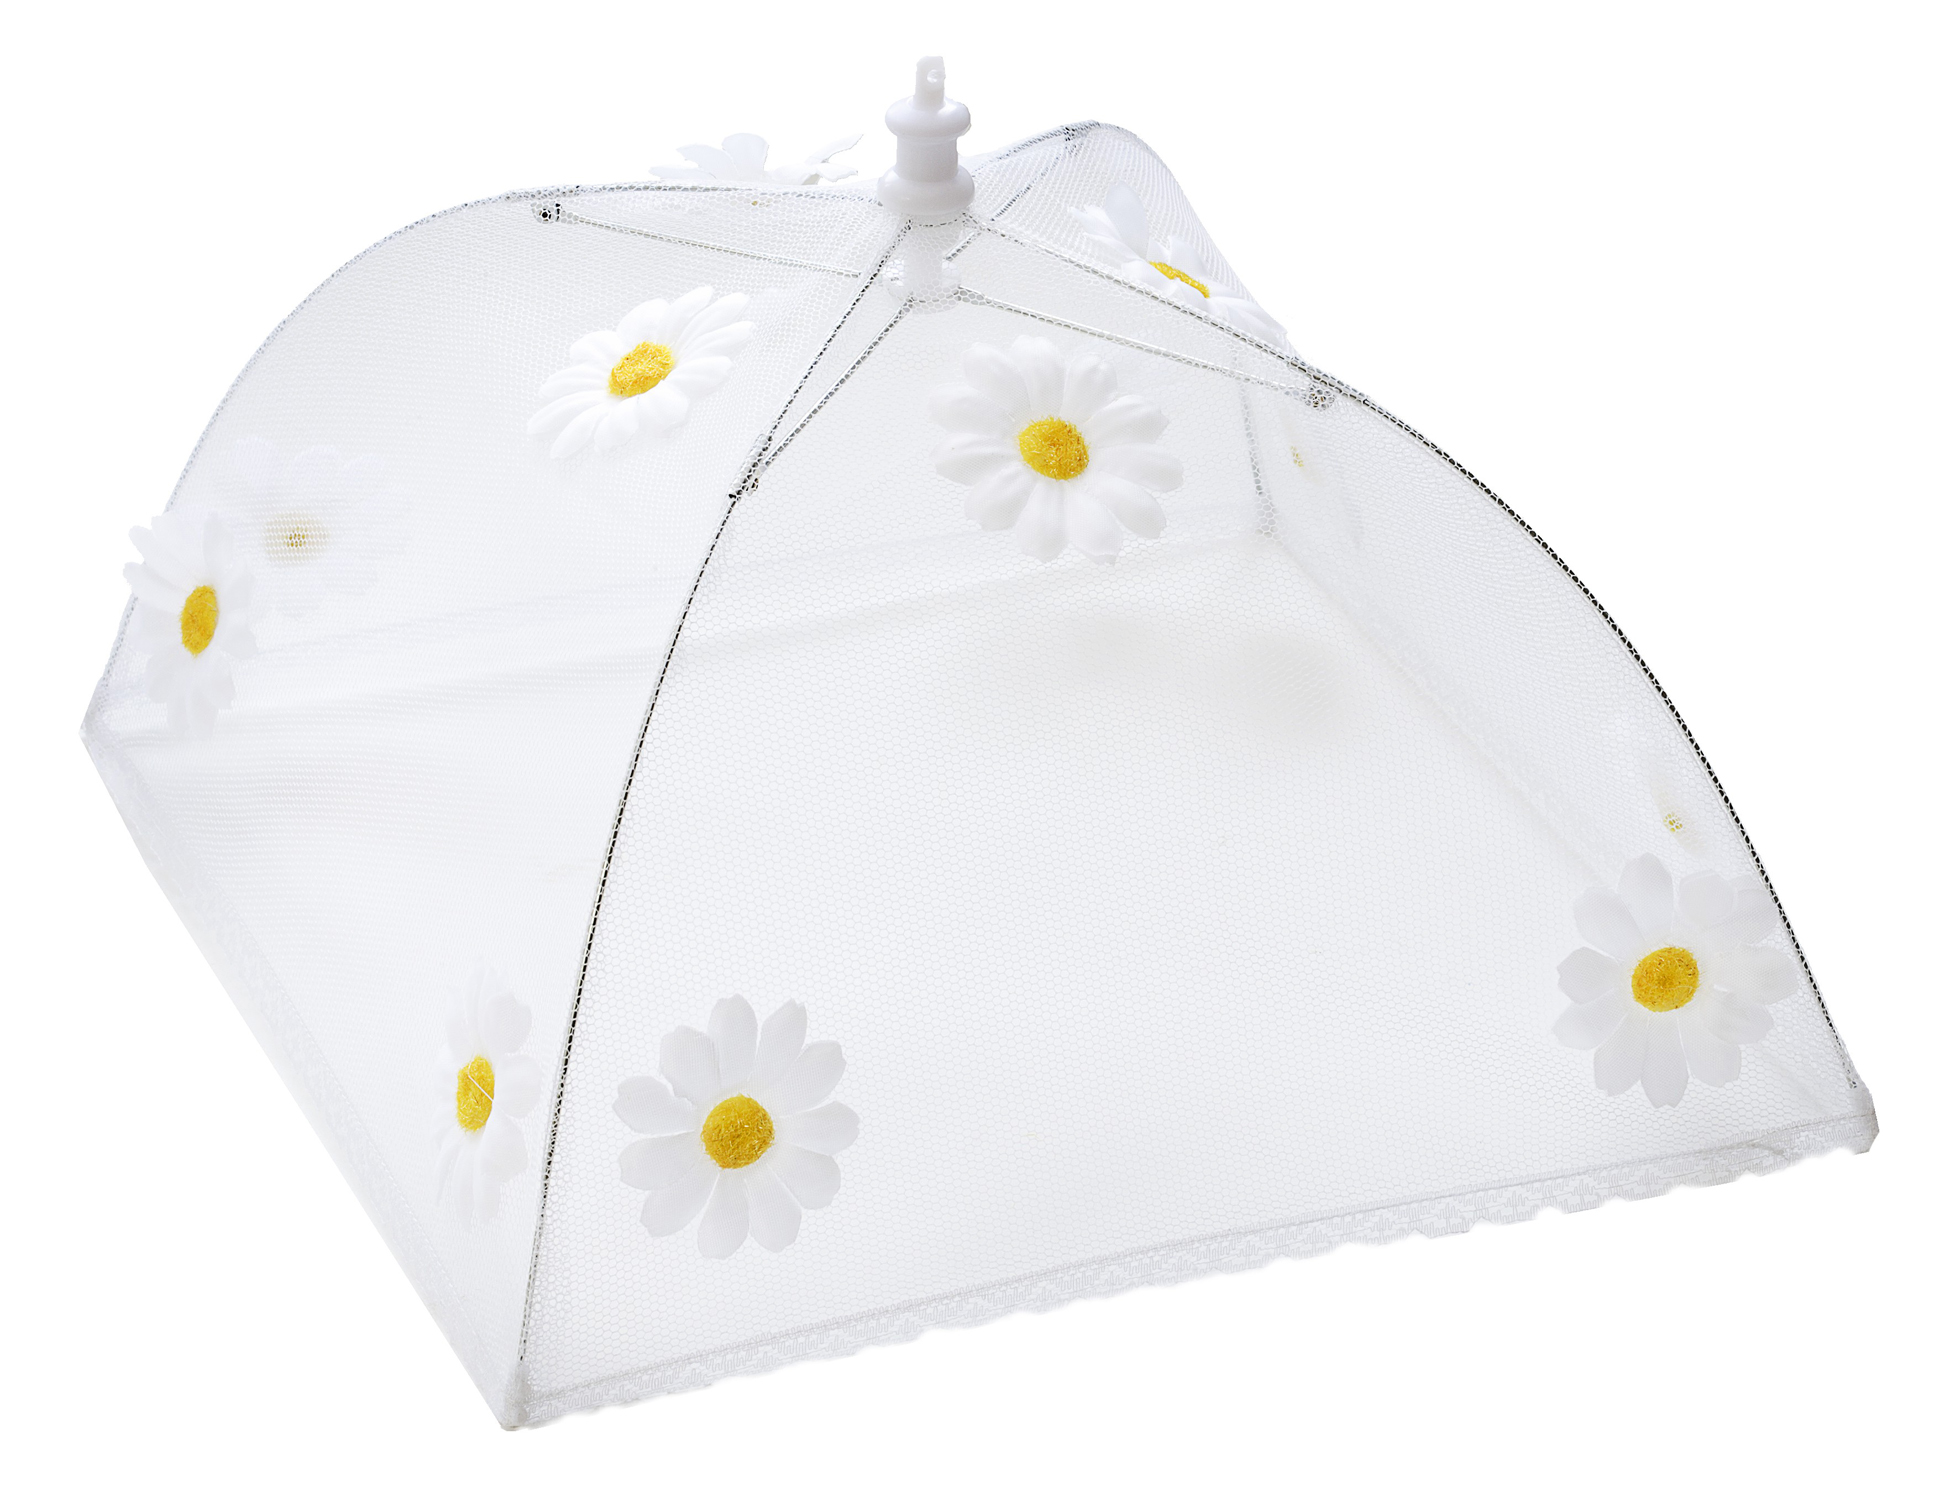 Epicurean Folding Mesh Net Food Cover Umbrella Collapsible